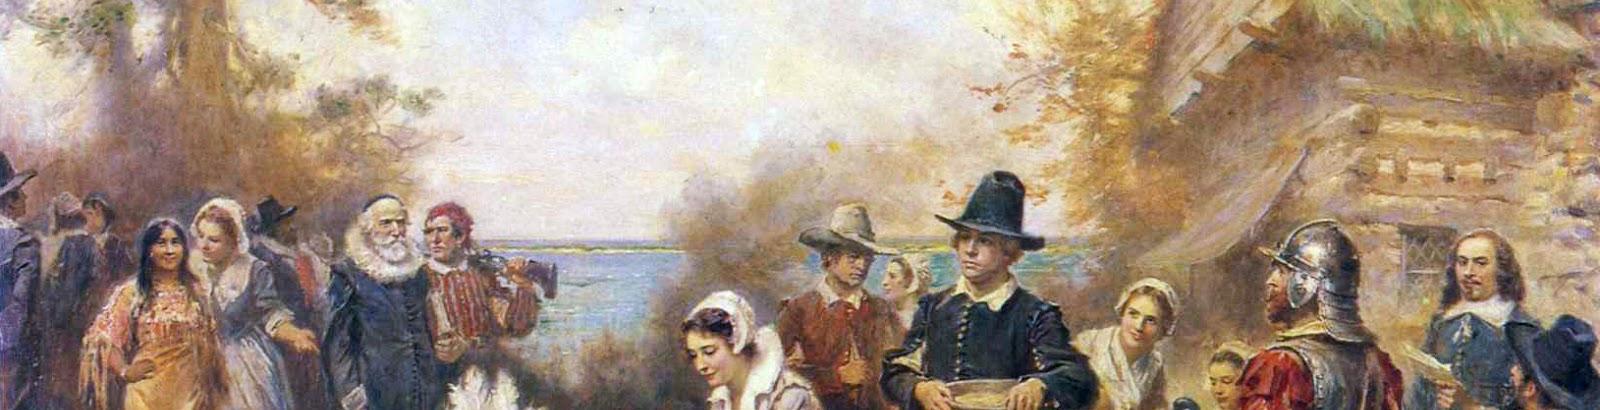 pictureicon-jean-leon-gerome-ferris-the-first-thanksgiving-1621-ca-1932.jpg